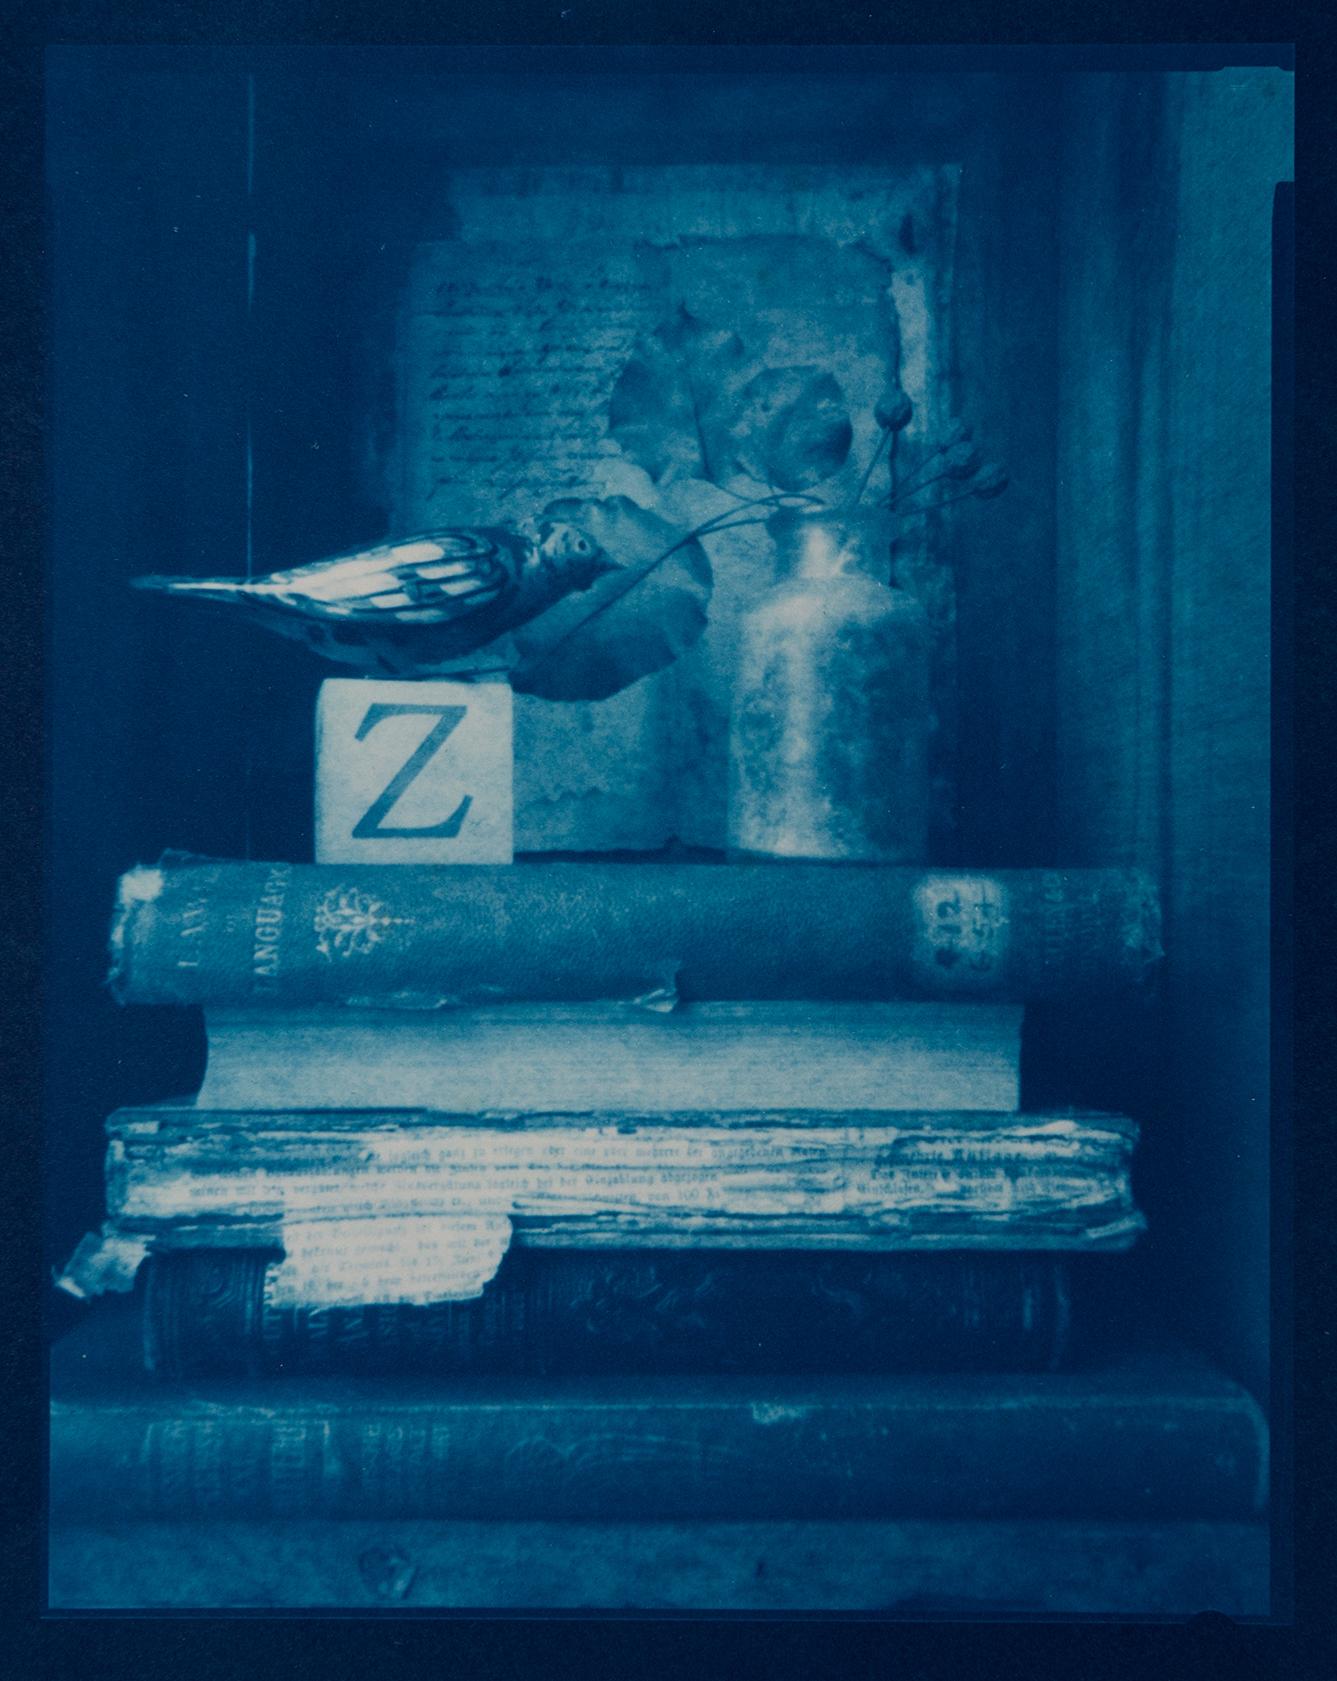 J Ferguson Poznan bird-Z 2012 pinhole cyanotype